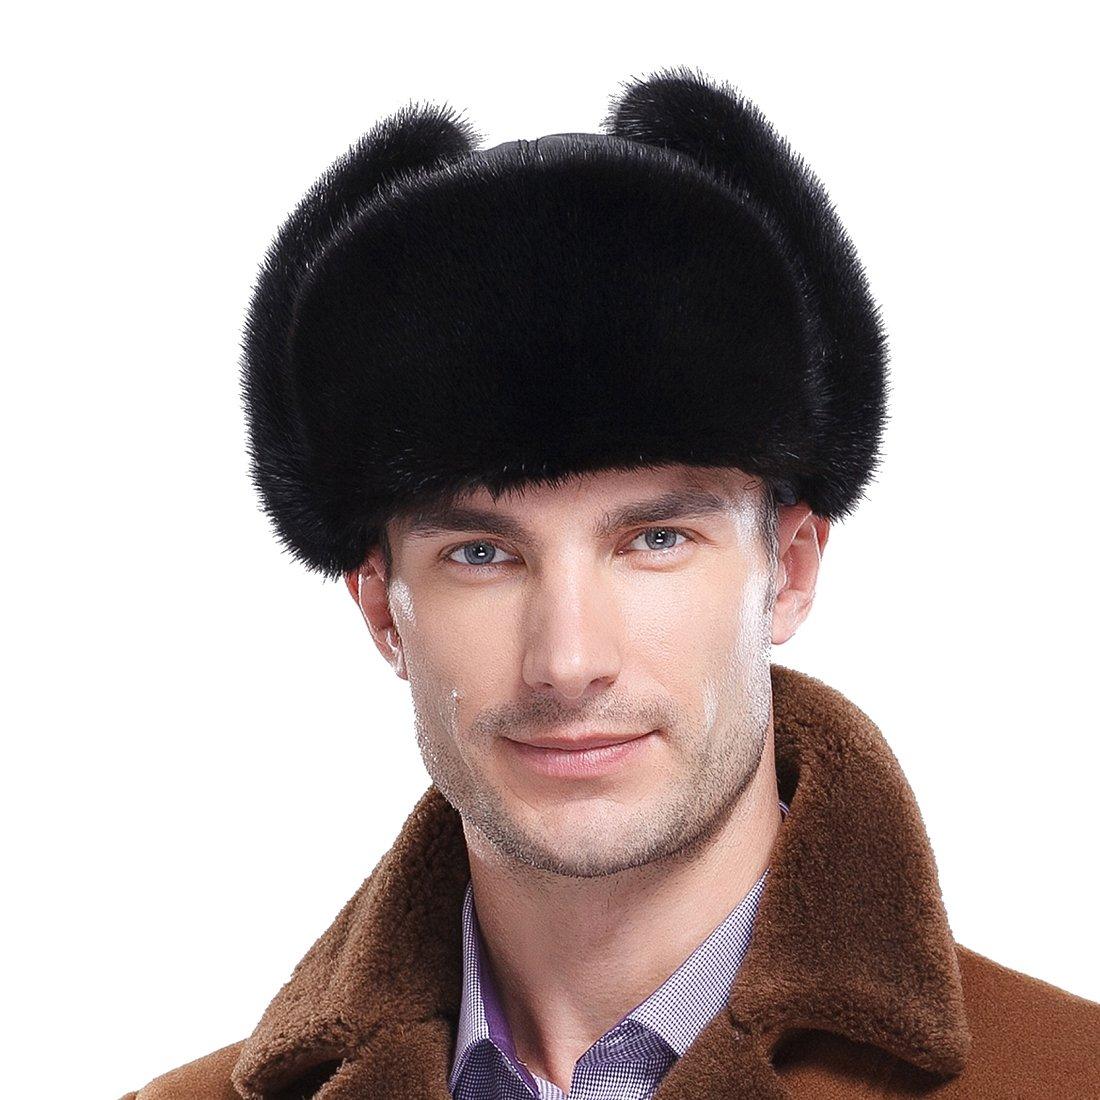 URSFUR Classic Men's Mink Fur & Leather Russian Ushanka Hats (One Size, Black) by URSFUR